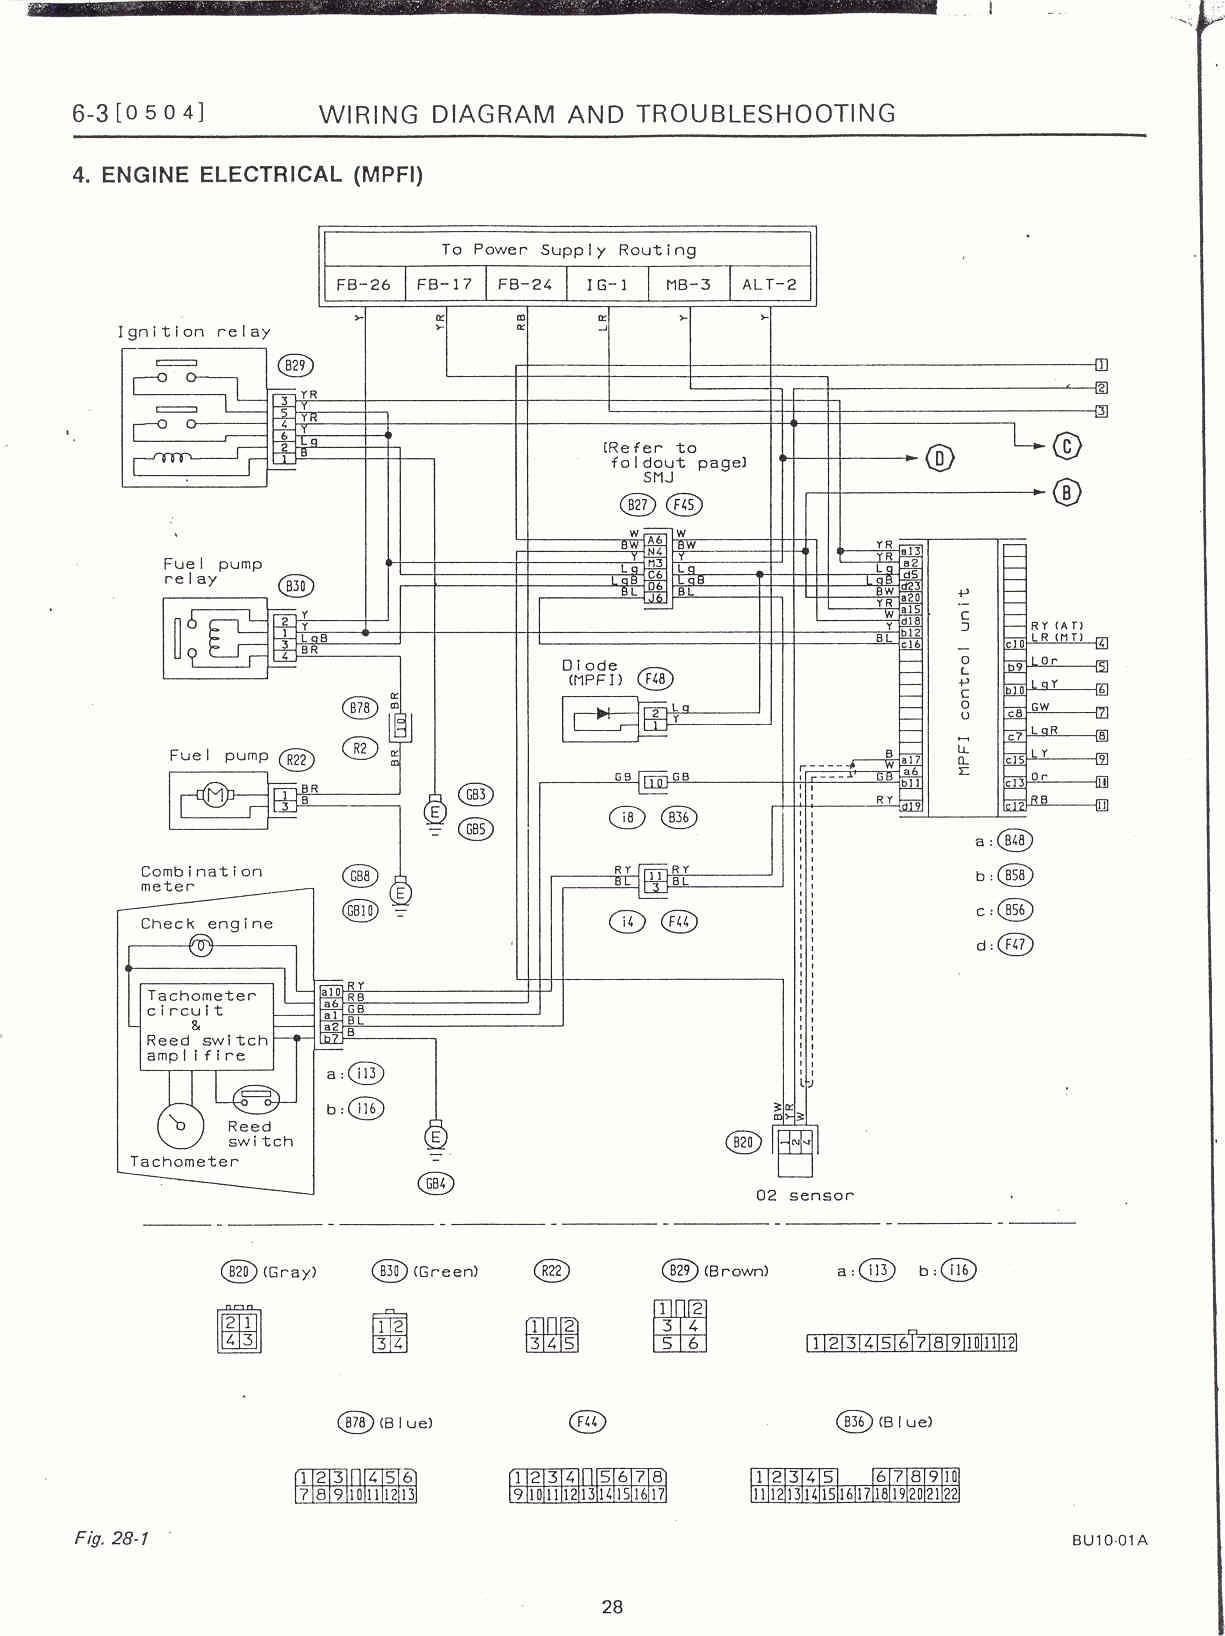 2002 subaru outback exhaust diagram bryant furnace wiring engine